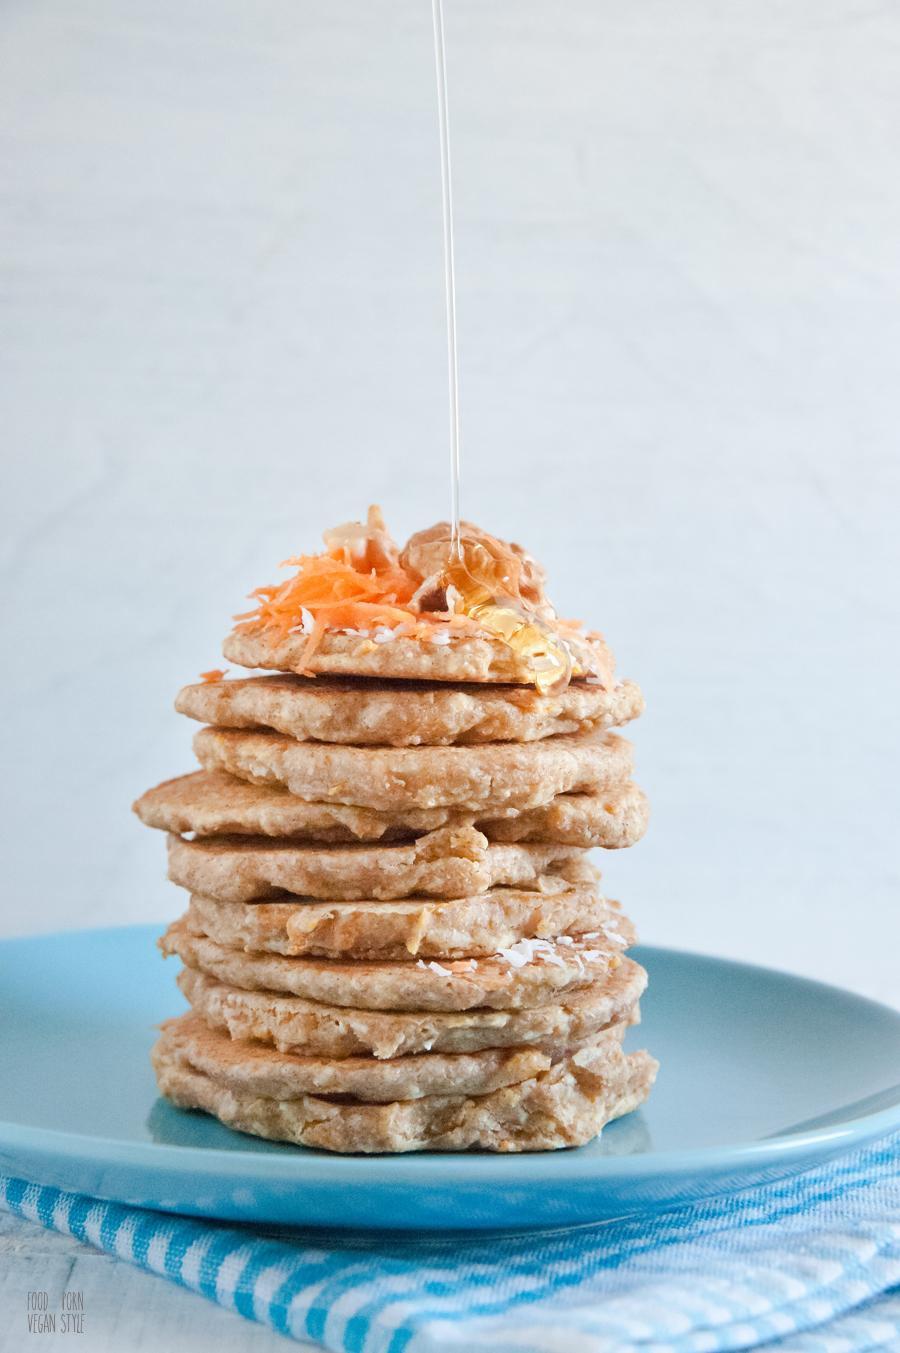 Vegan coconut-carrot pancakes